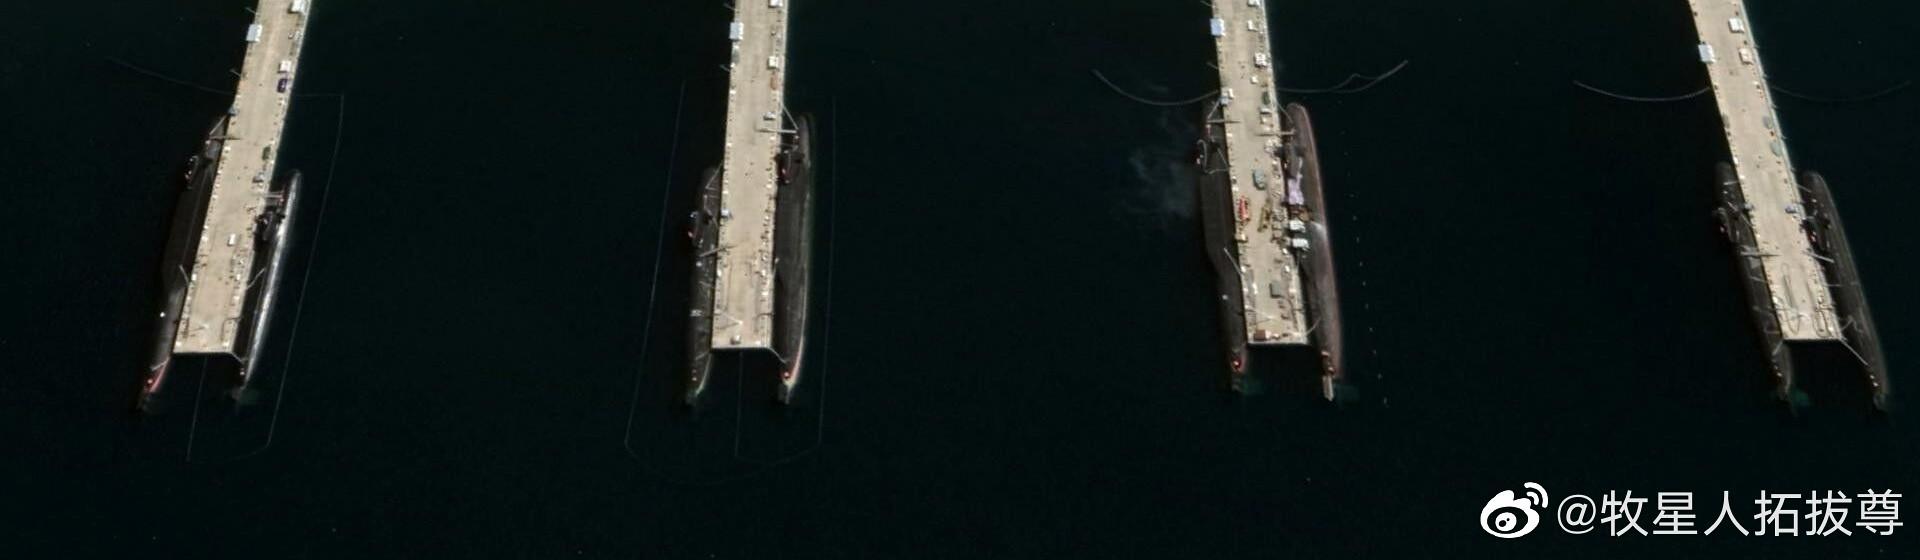 China's Nuclear Ballistic Submarines 51006410